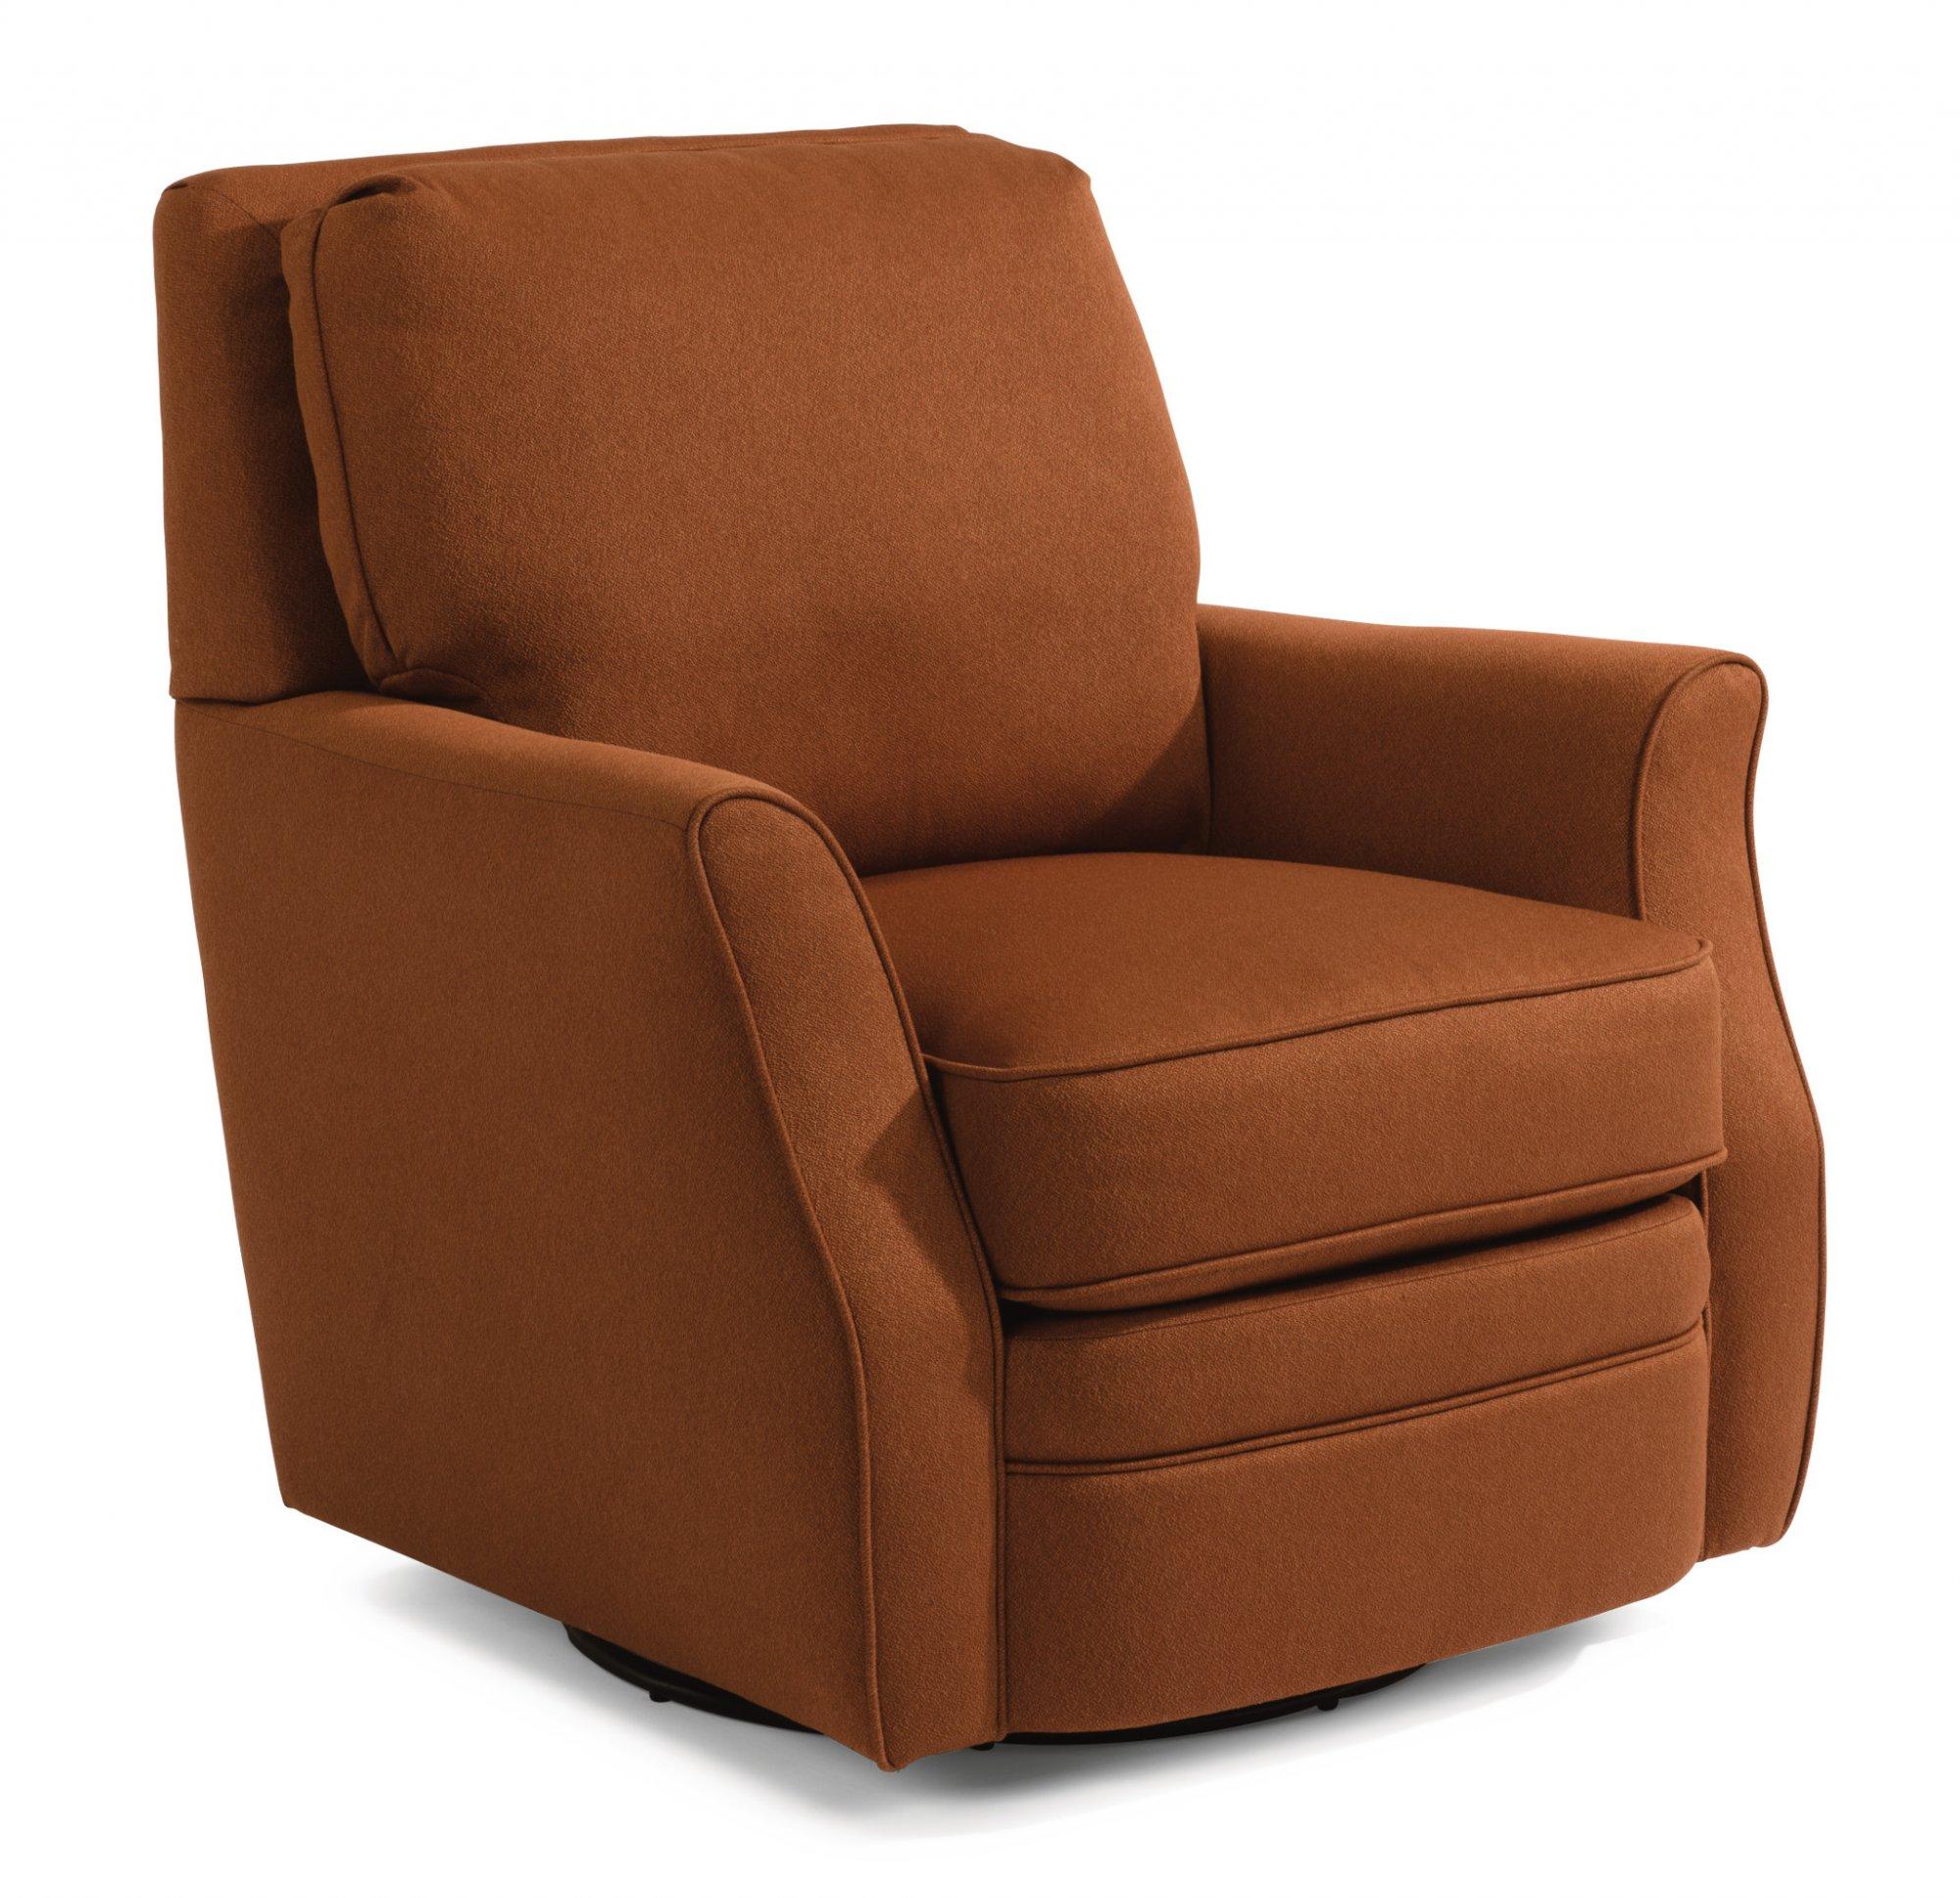 Model: 0125-11 | Flexsteel Brynn  Fabric Swivel Chair